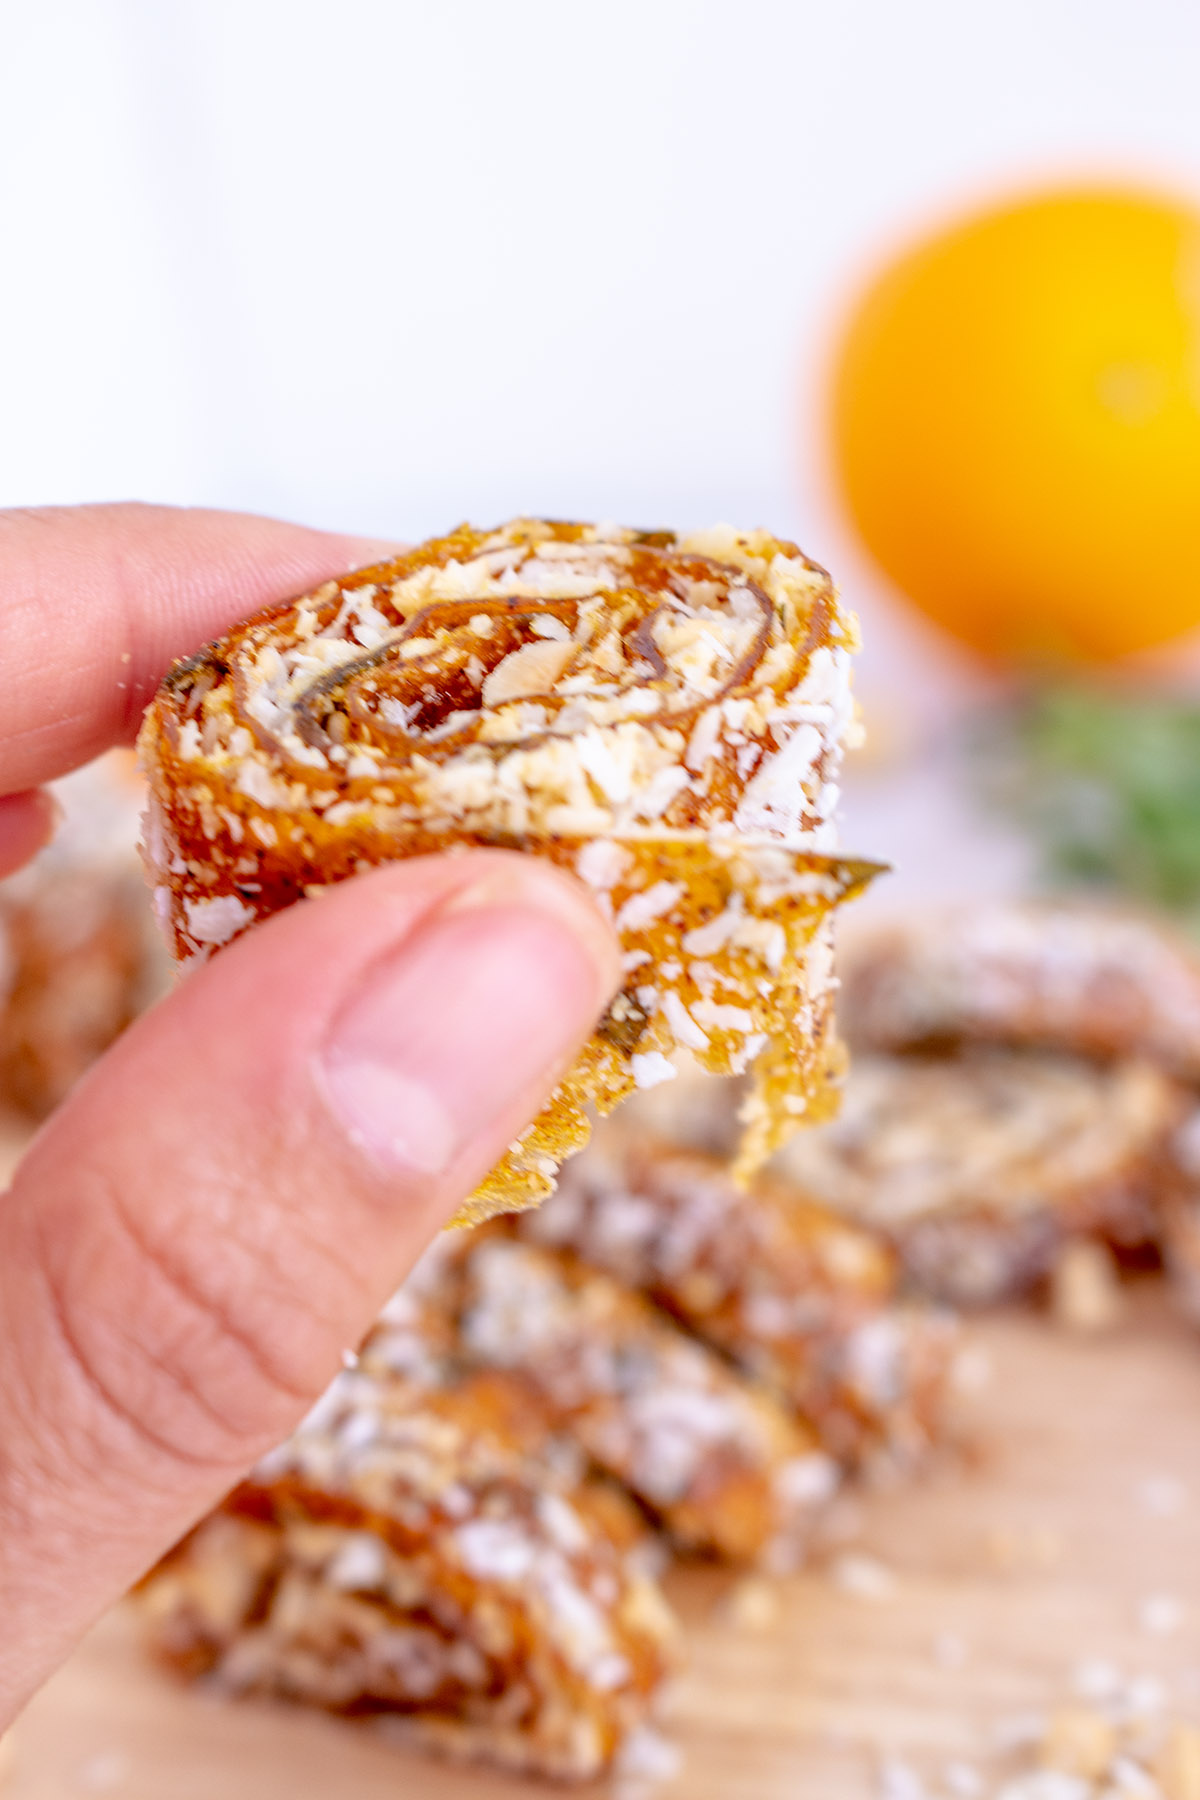 orangen Fruchtleder, fruit leather, diy fruit gum, orange tarragon fruit leather, winter sweets, vegan sweets